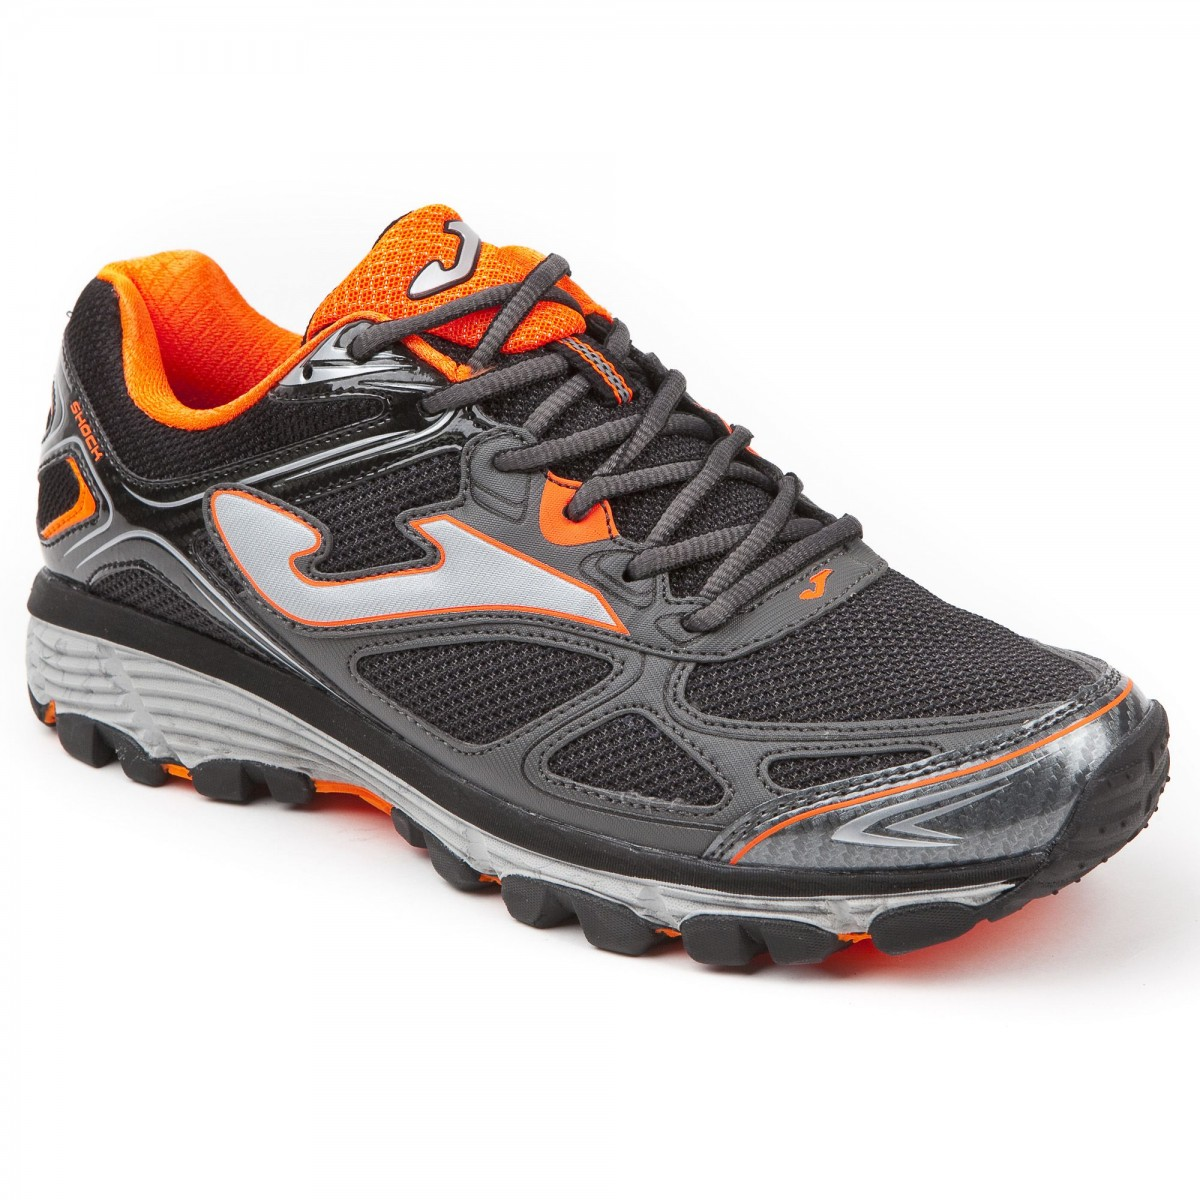 Joma Tk Shock Man - scarpa trail running uomo grigia arancio  bdc3e07ac4b